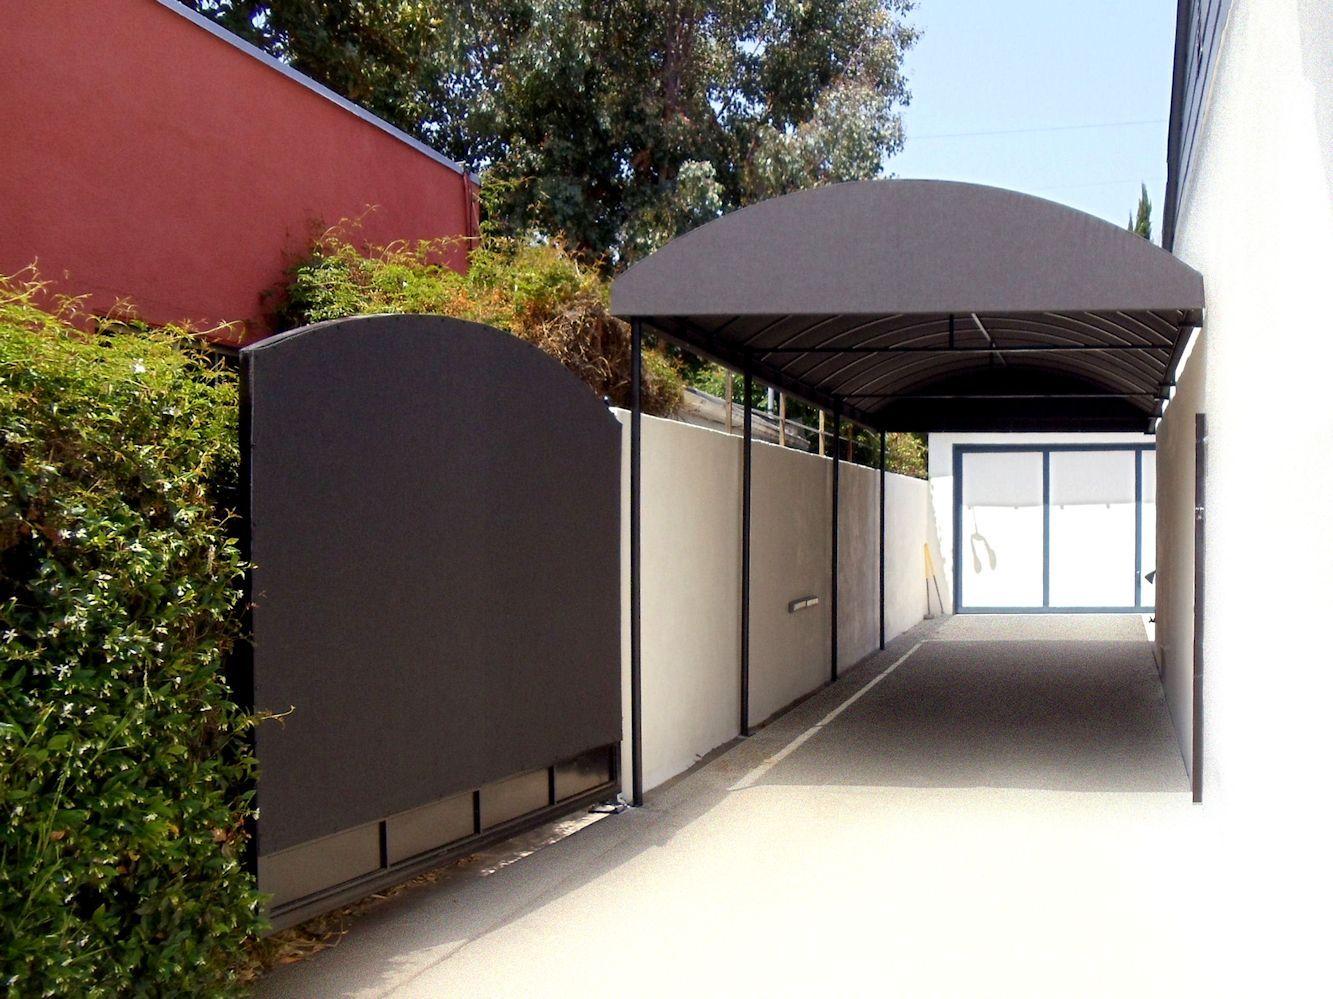 Carport with gate cover carport ideas pinterest gate for Carport gate ideas